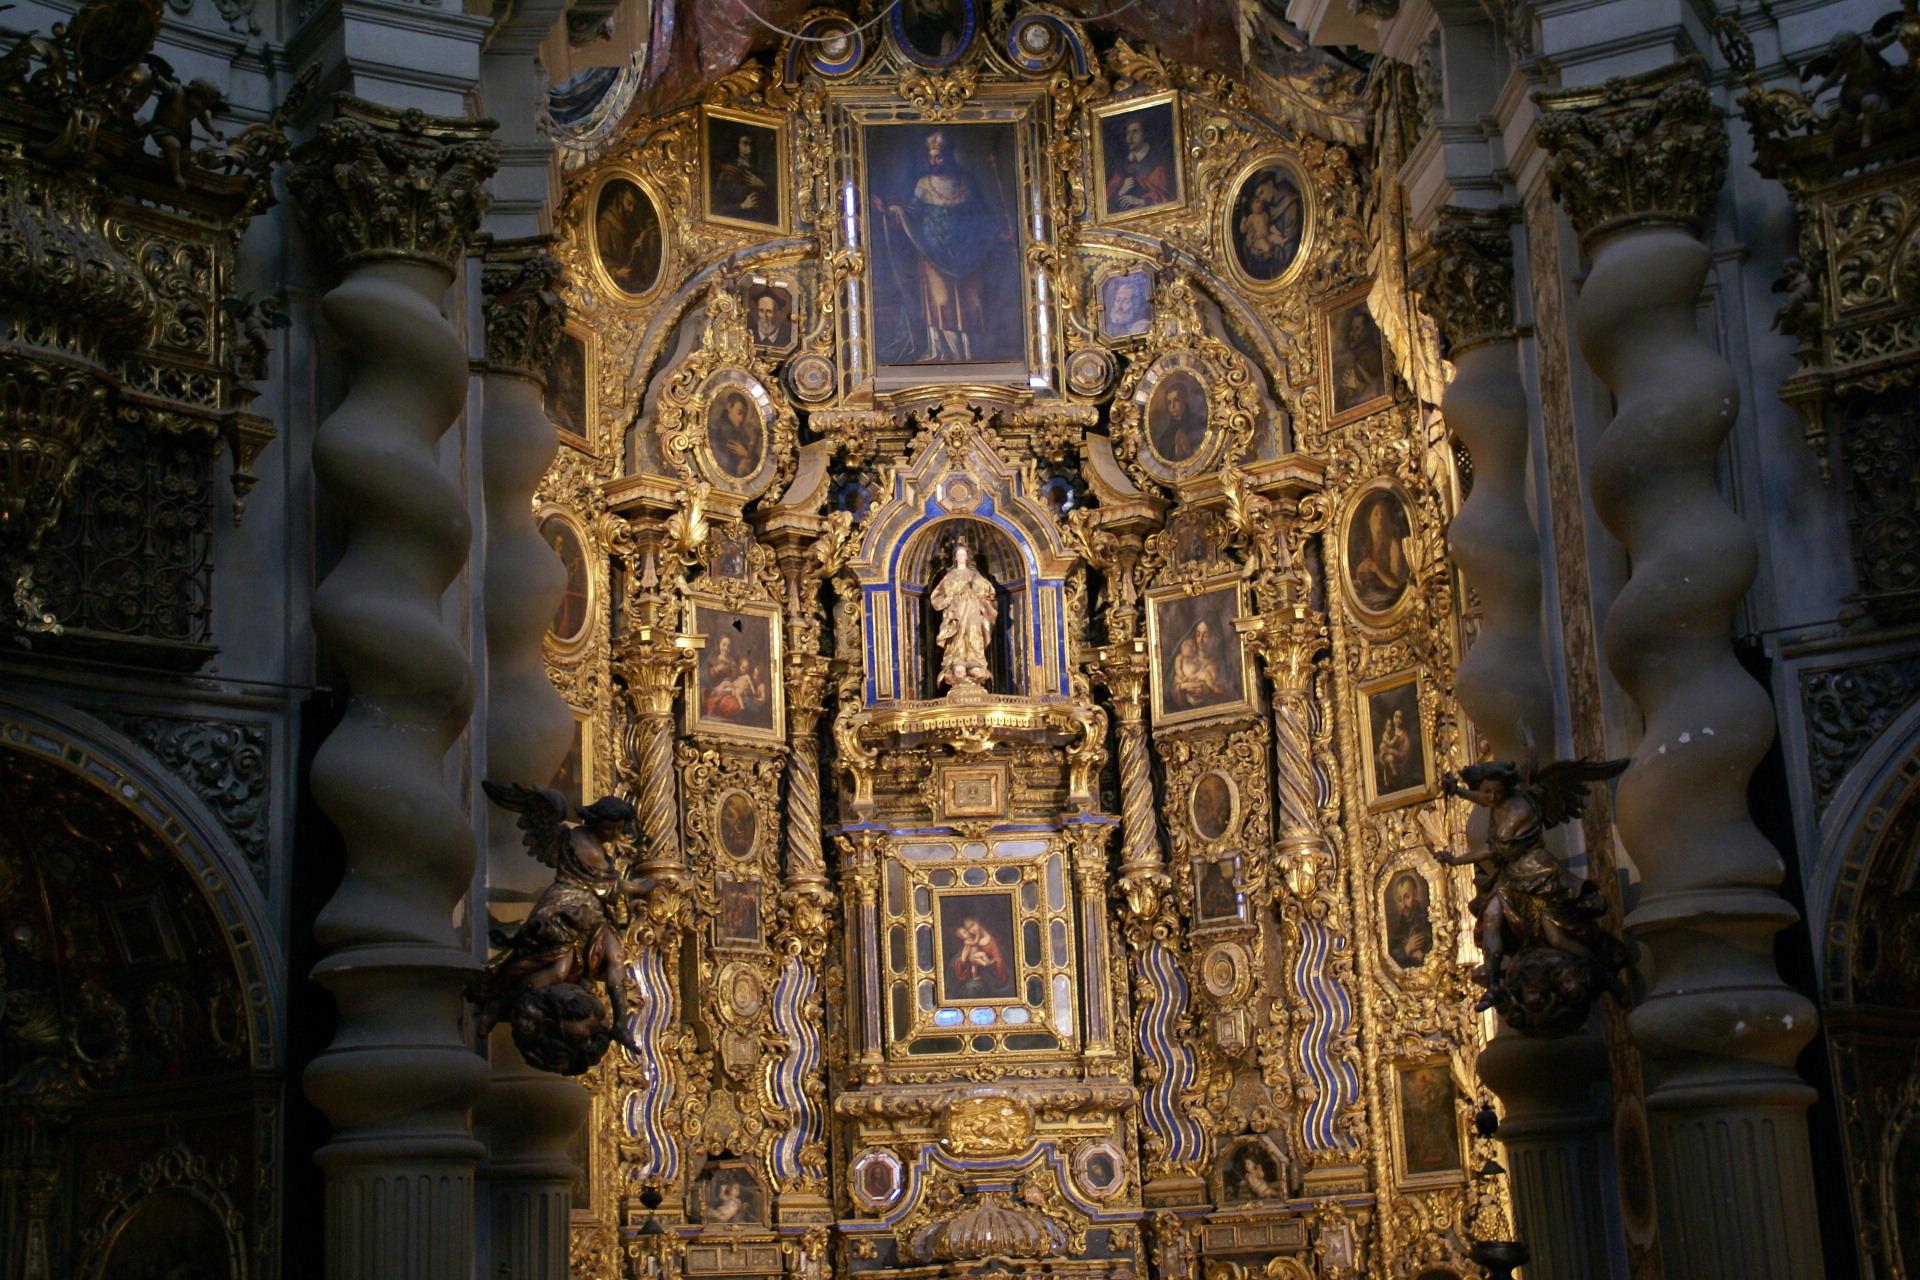 http://upload.wikimedia.org/wikipedia/commons/9/9e/2007.10.04_228_Iglesia_San_Luis_Sevilla.jpg